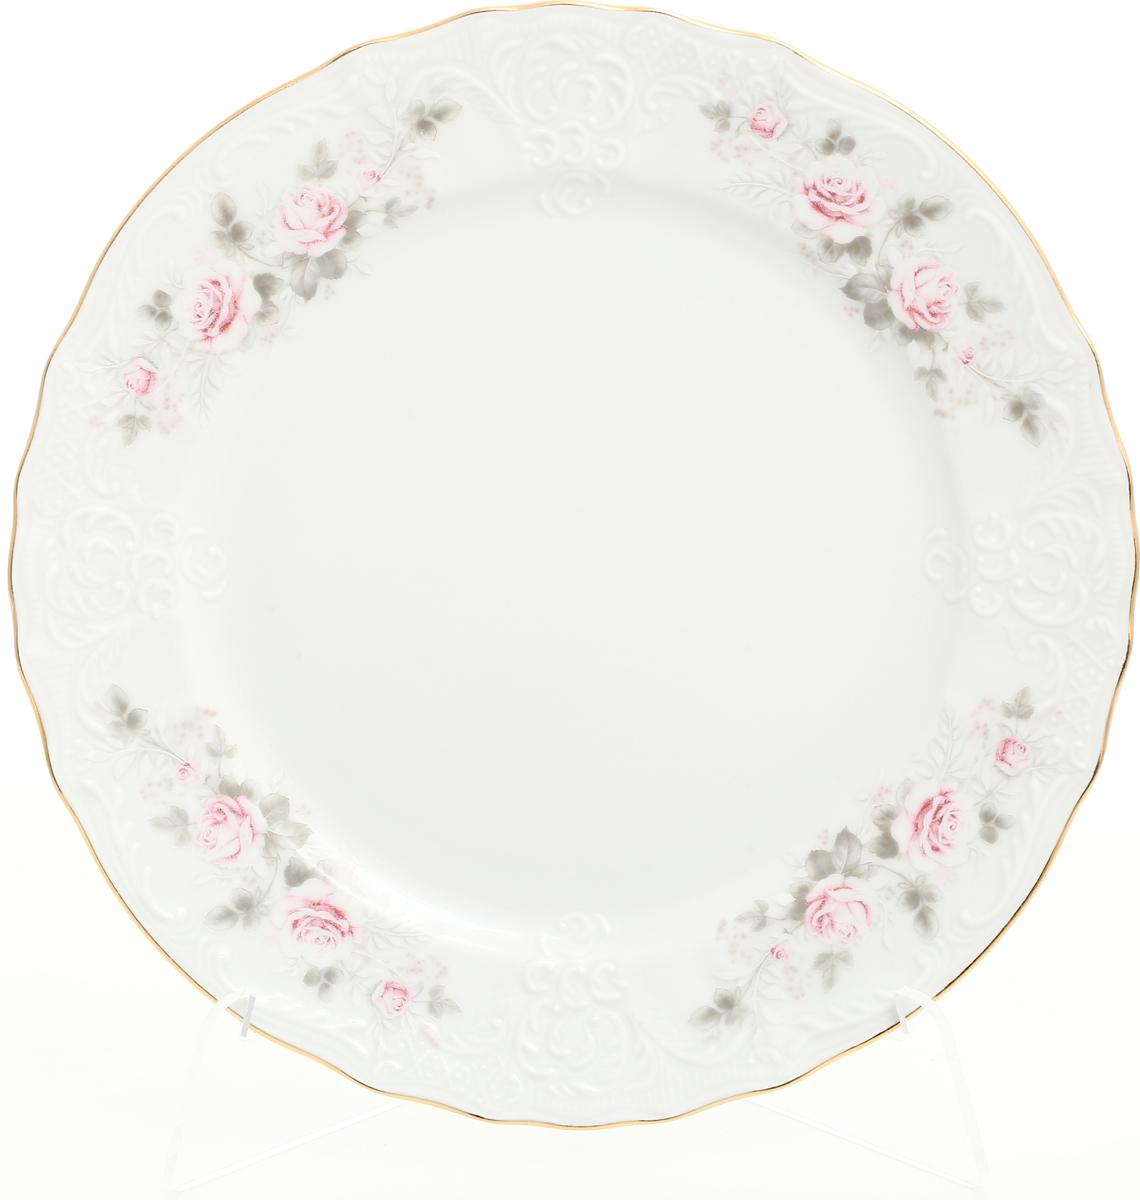 Набор тарелок Bernadotte Серая роза. Золото, диаметр 21 см, 6 шт набор из 2 тарелок 21 см infinity